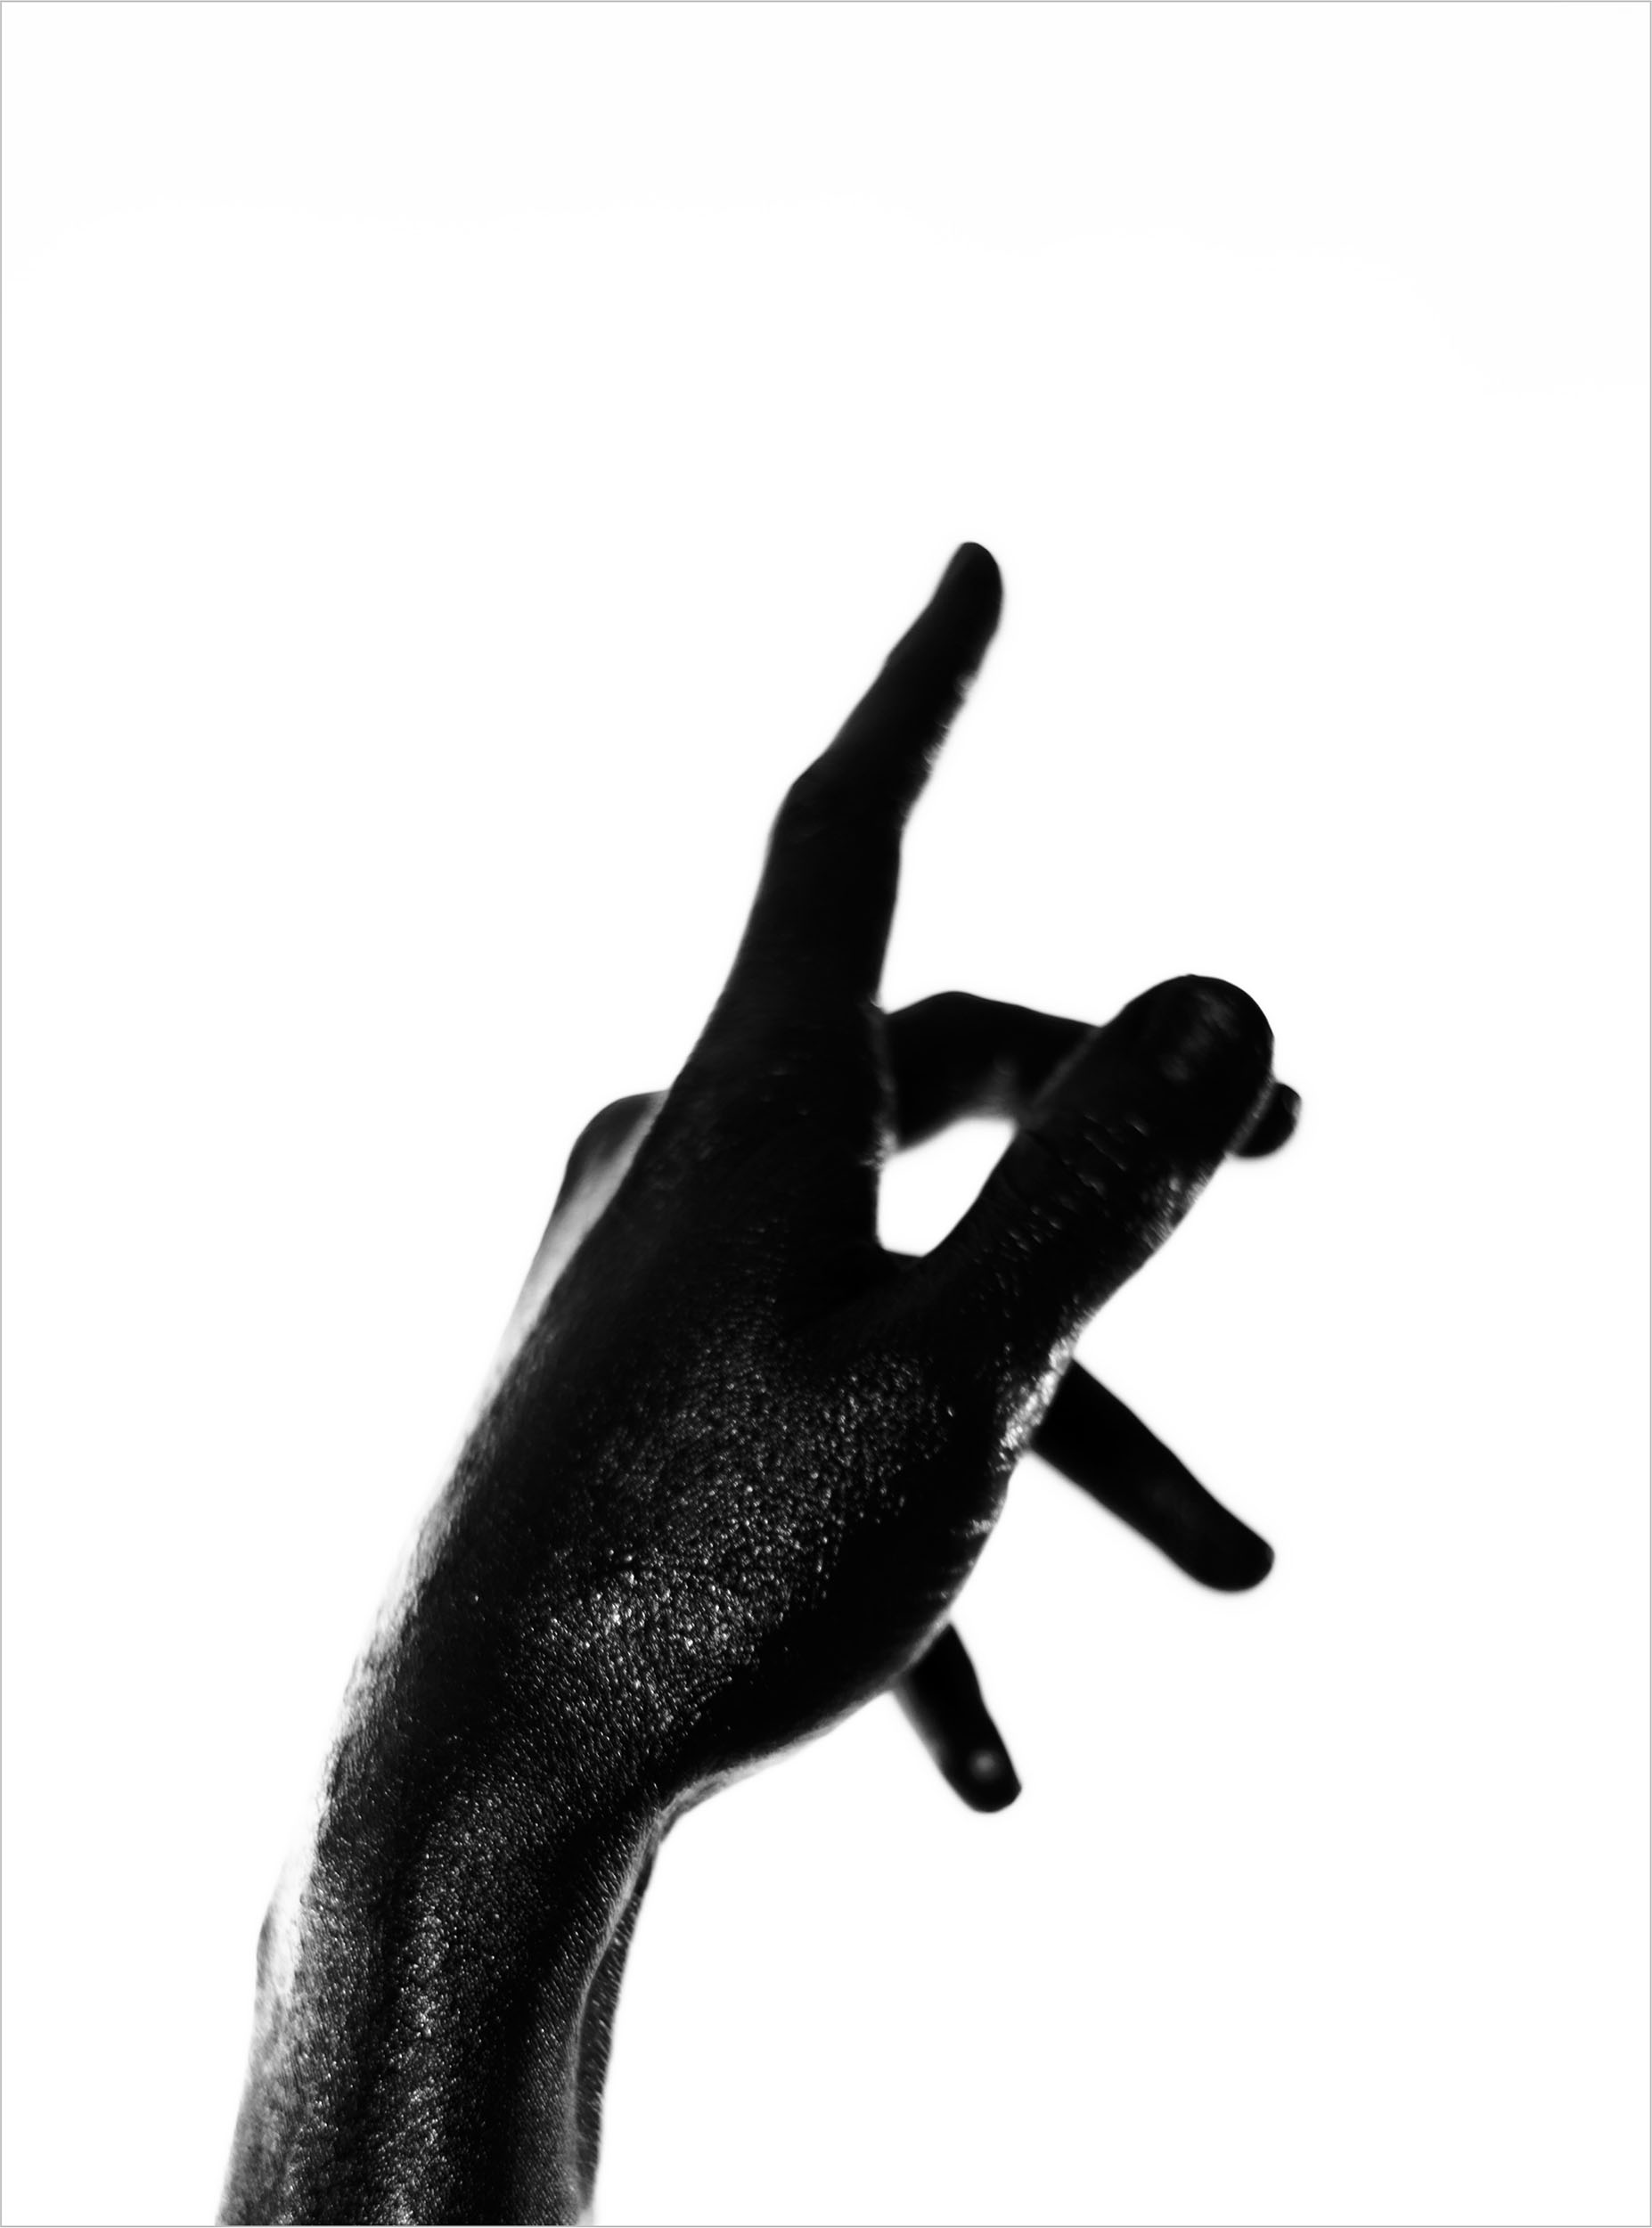 Hand-5.jpg